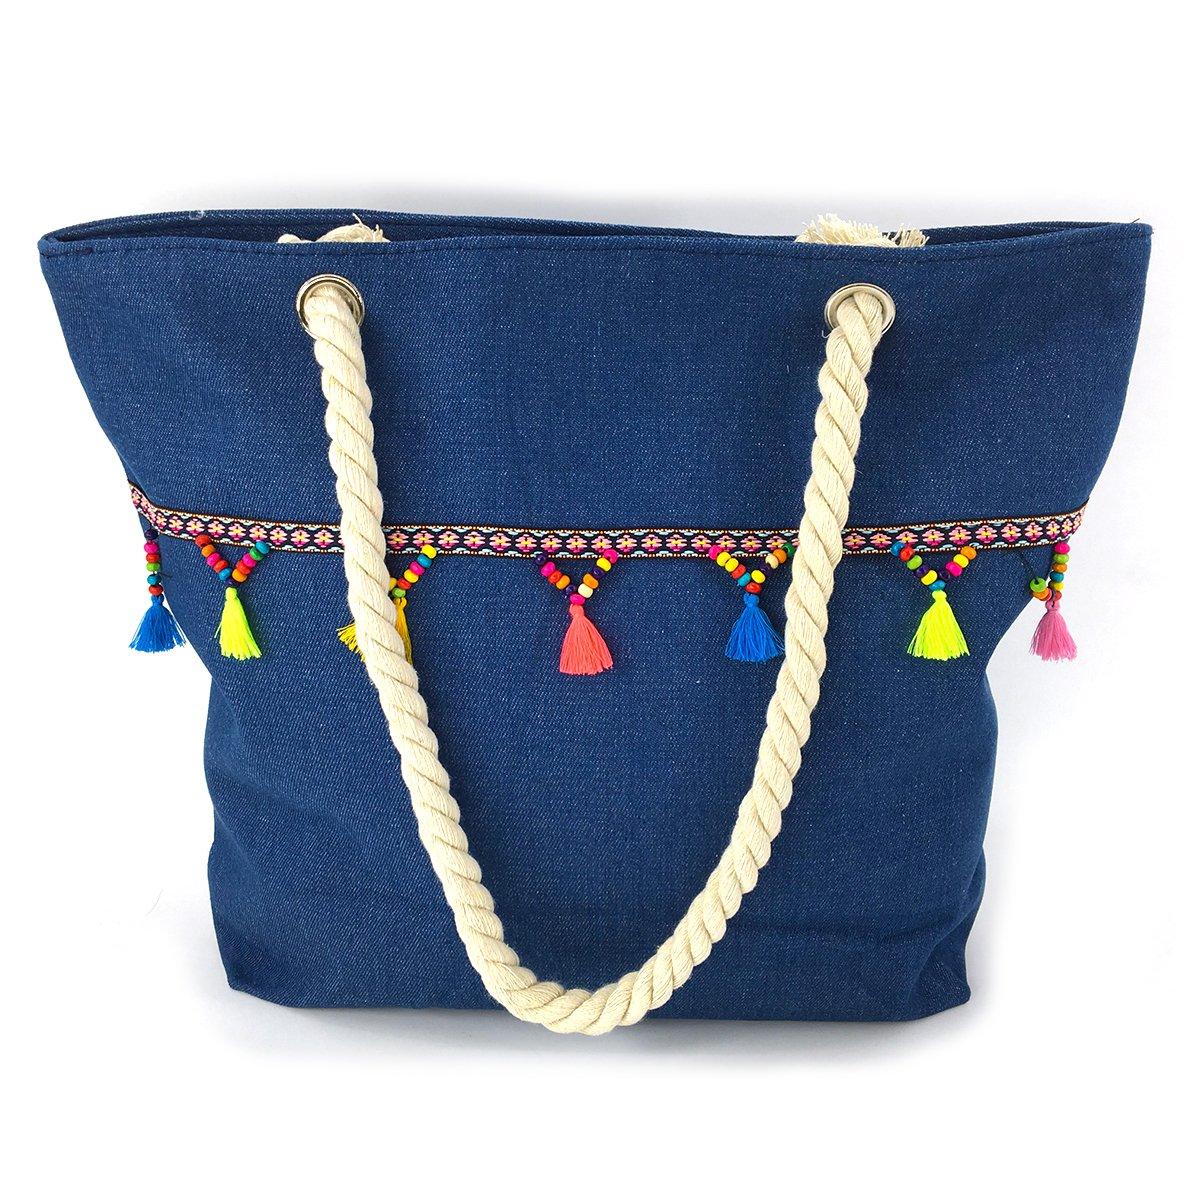 We We Denim Jeans Beach Bag, Handmade Duffel Bag, Boho Demin Tote Shoulder Bag with Tassels